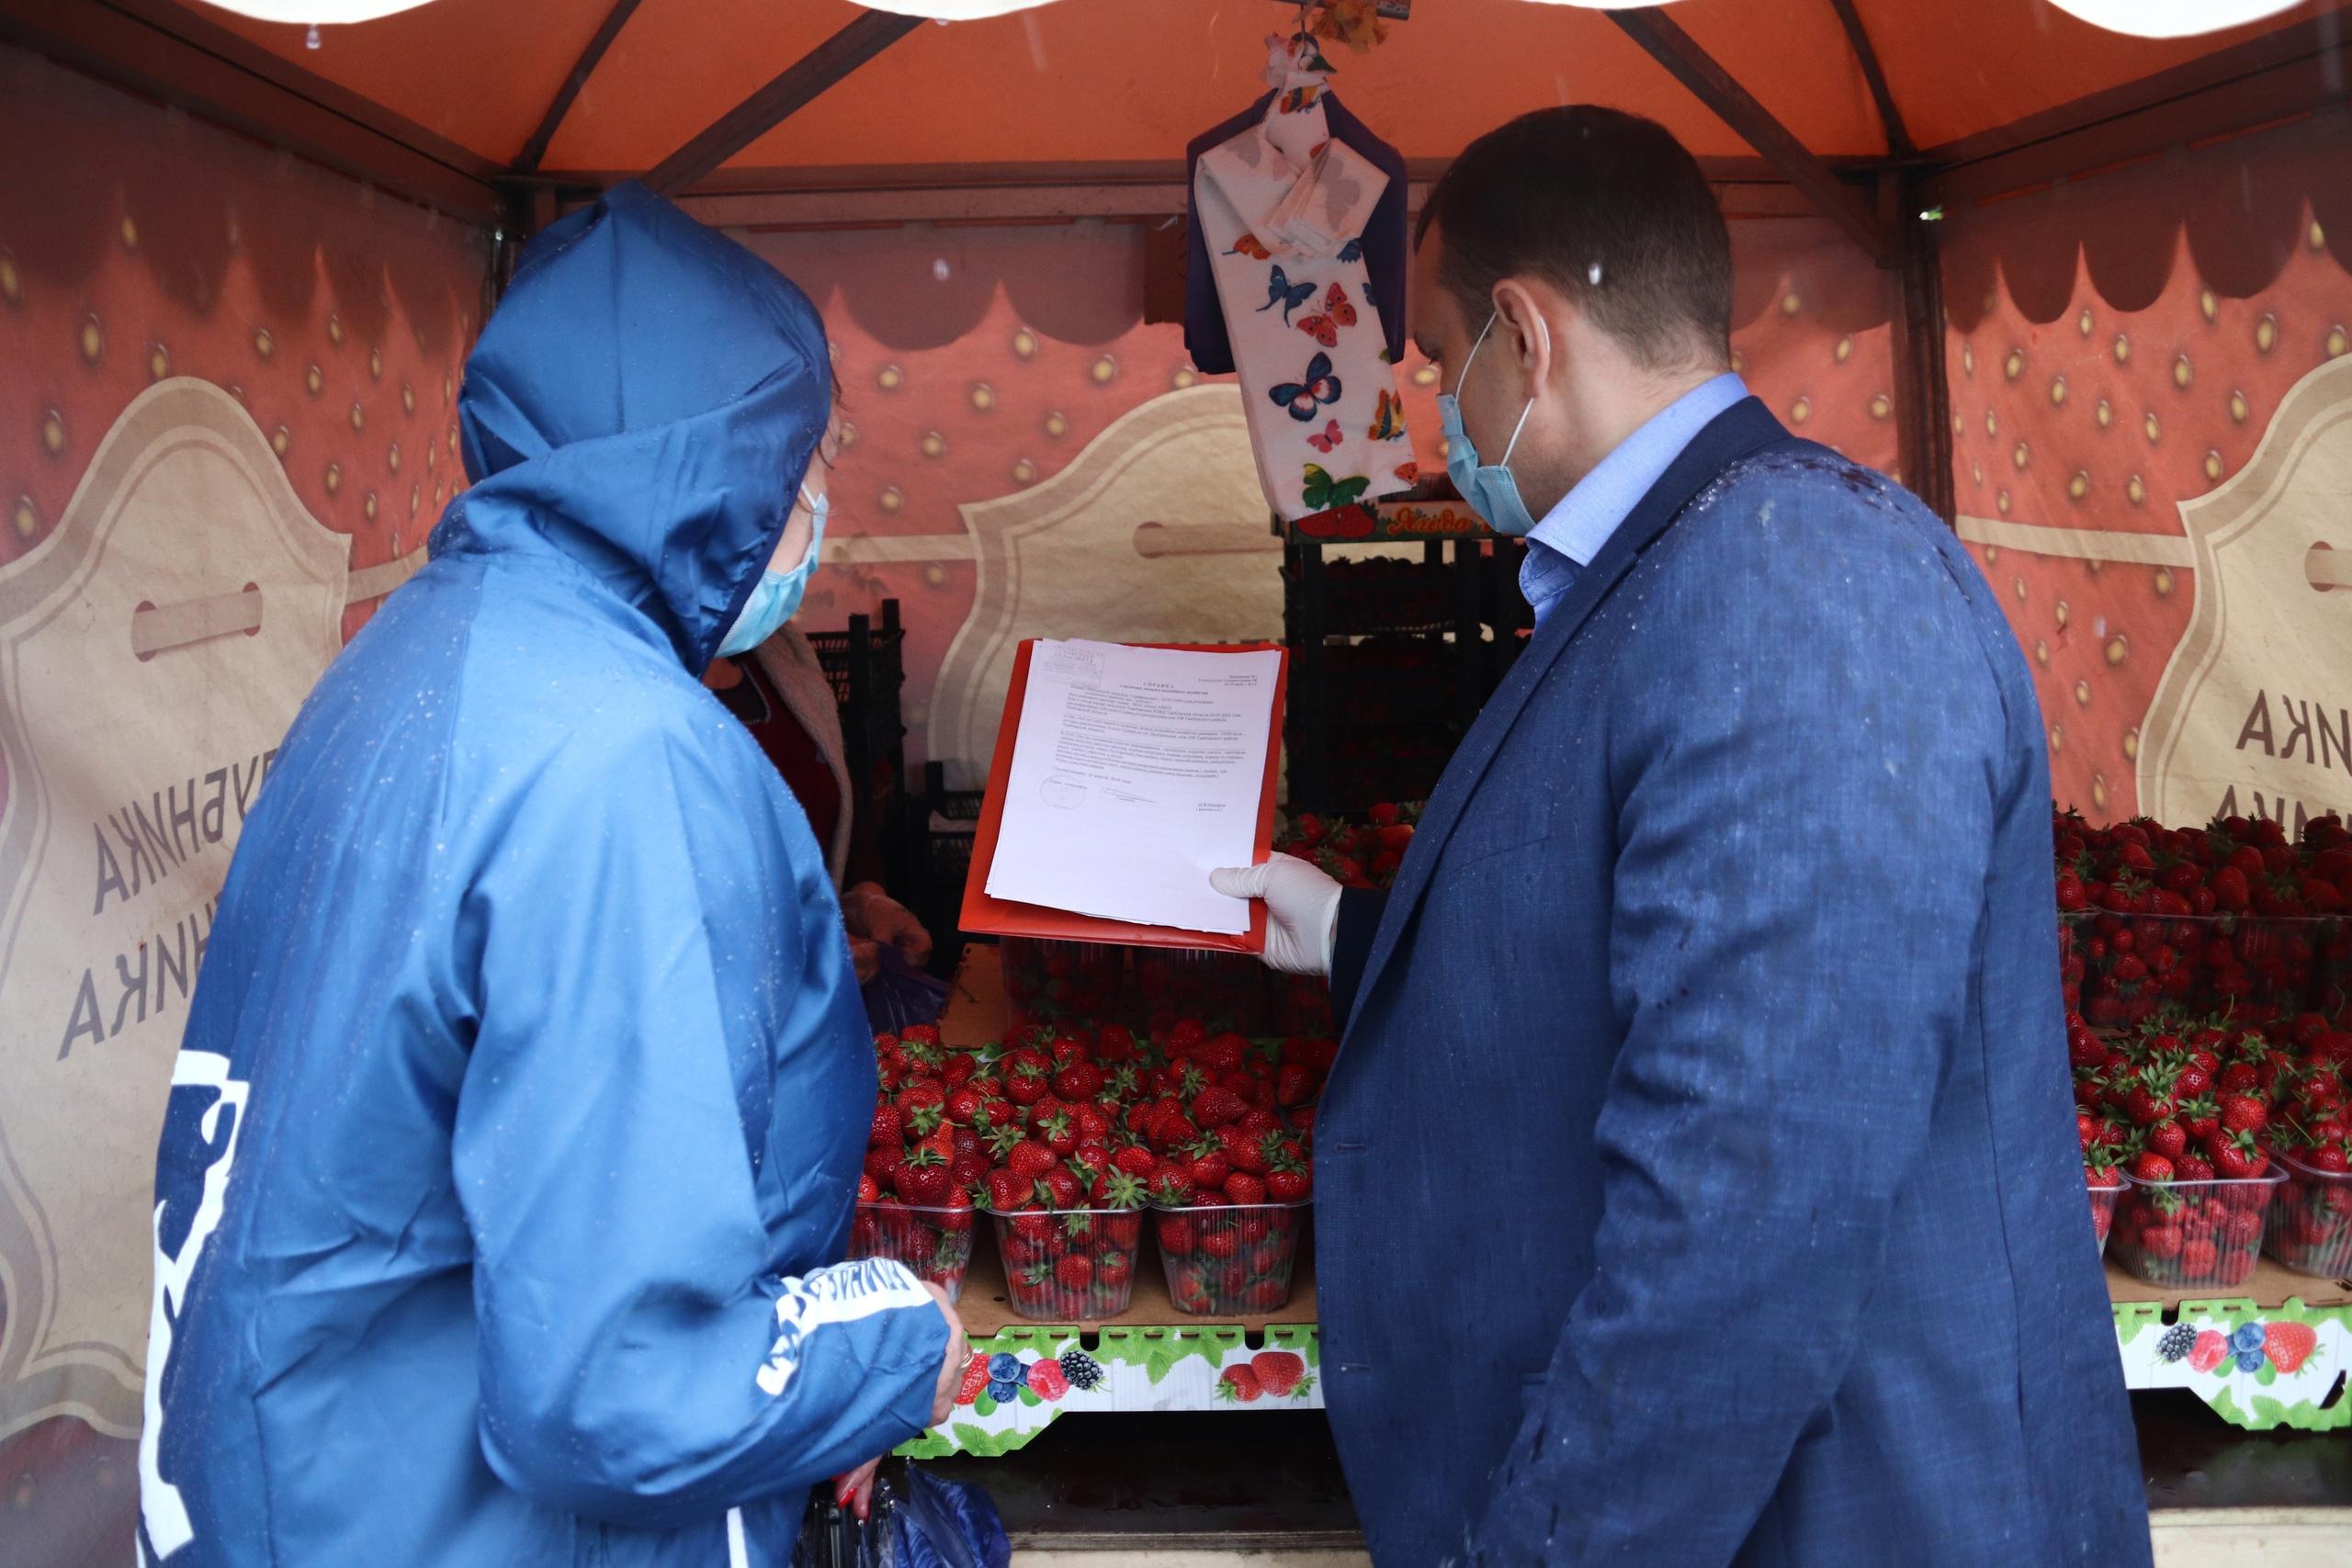 Точку продажи клубники проверили в Орехове-Борисове Южном